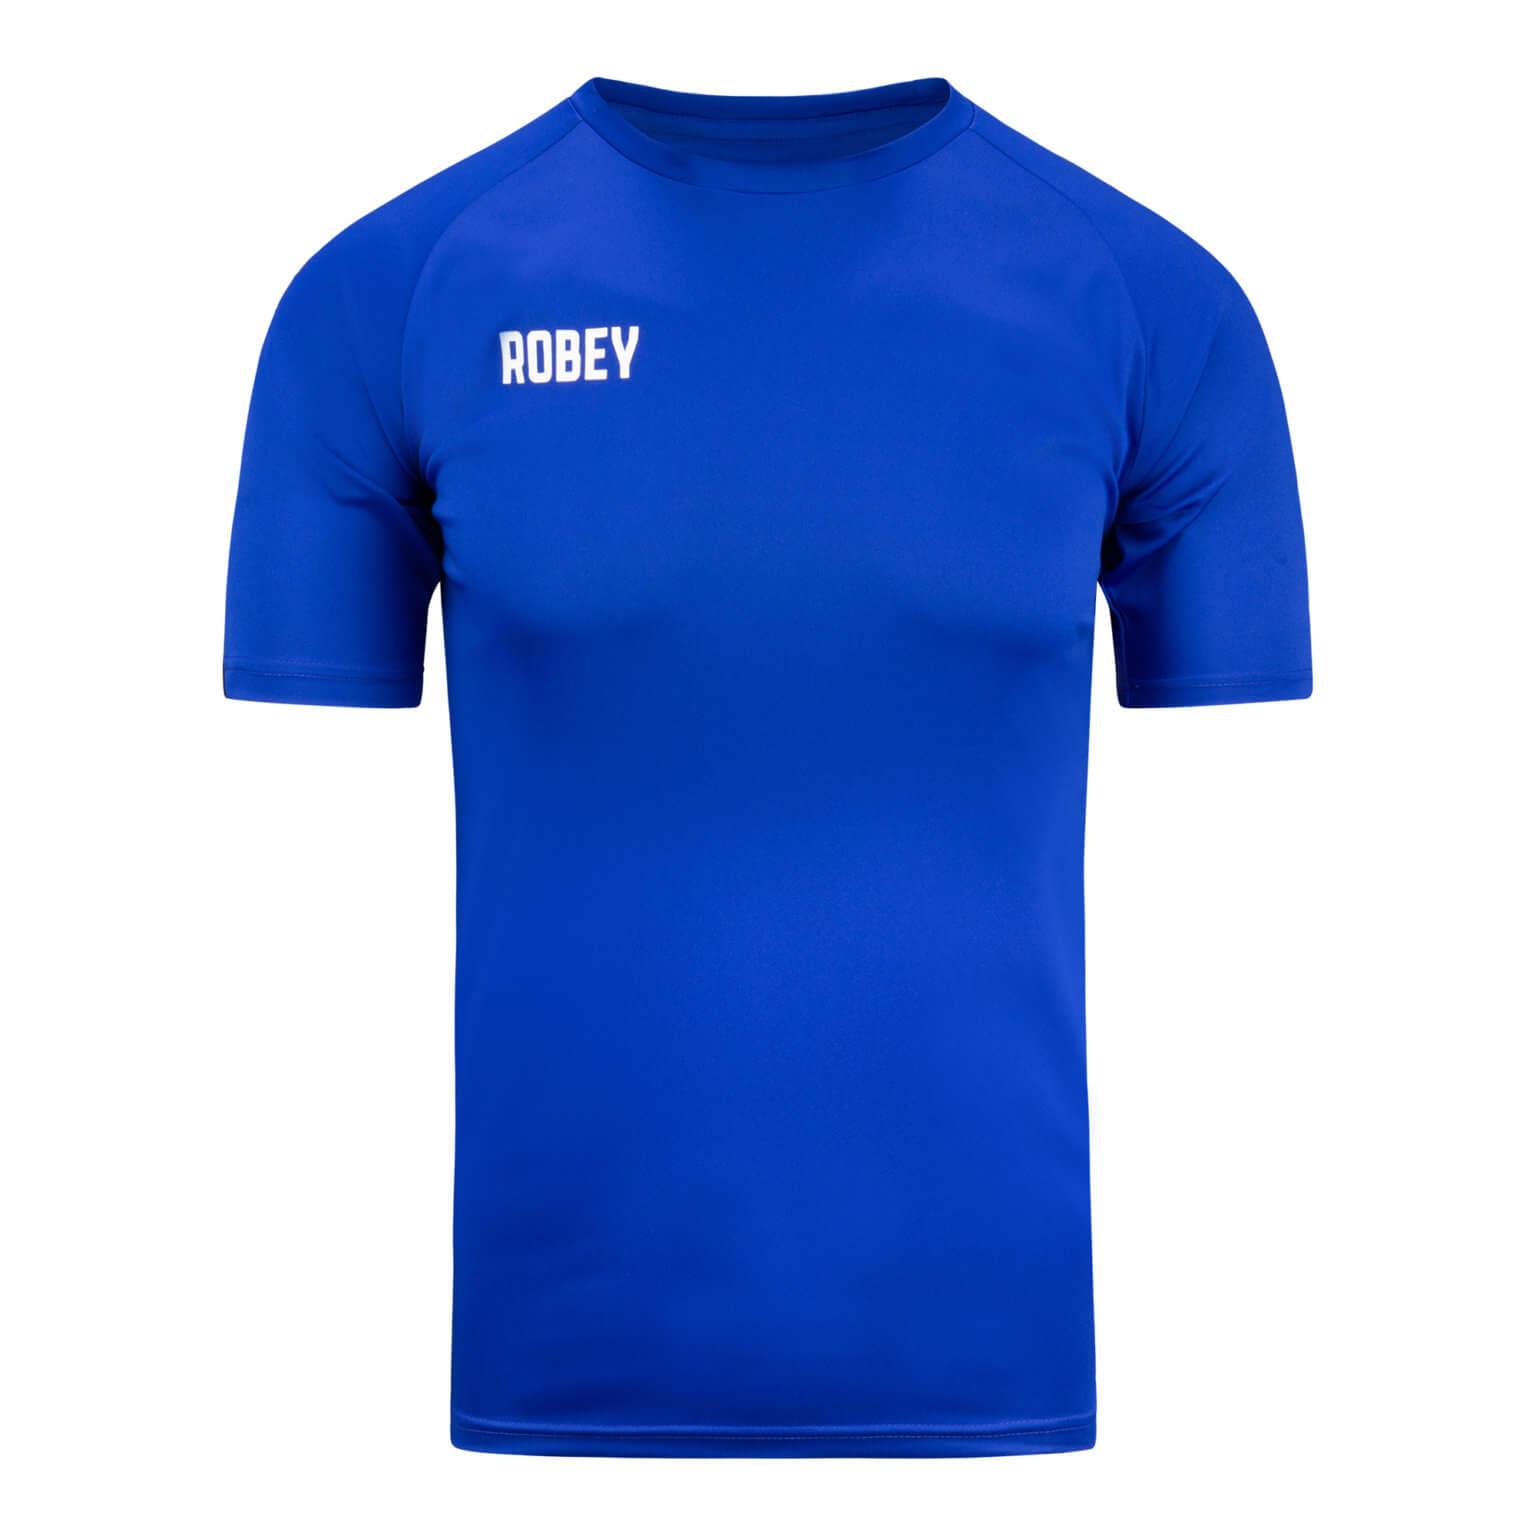 Robey Counter Shirt - Royal Blue